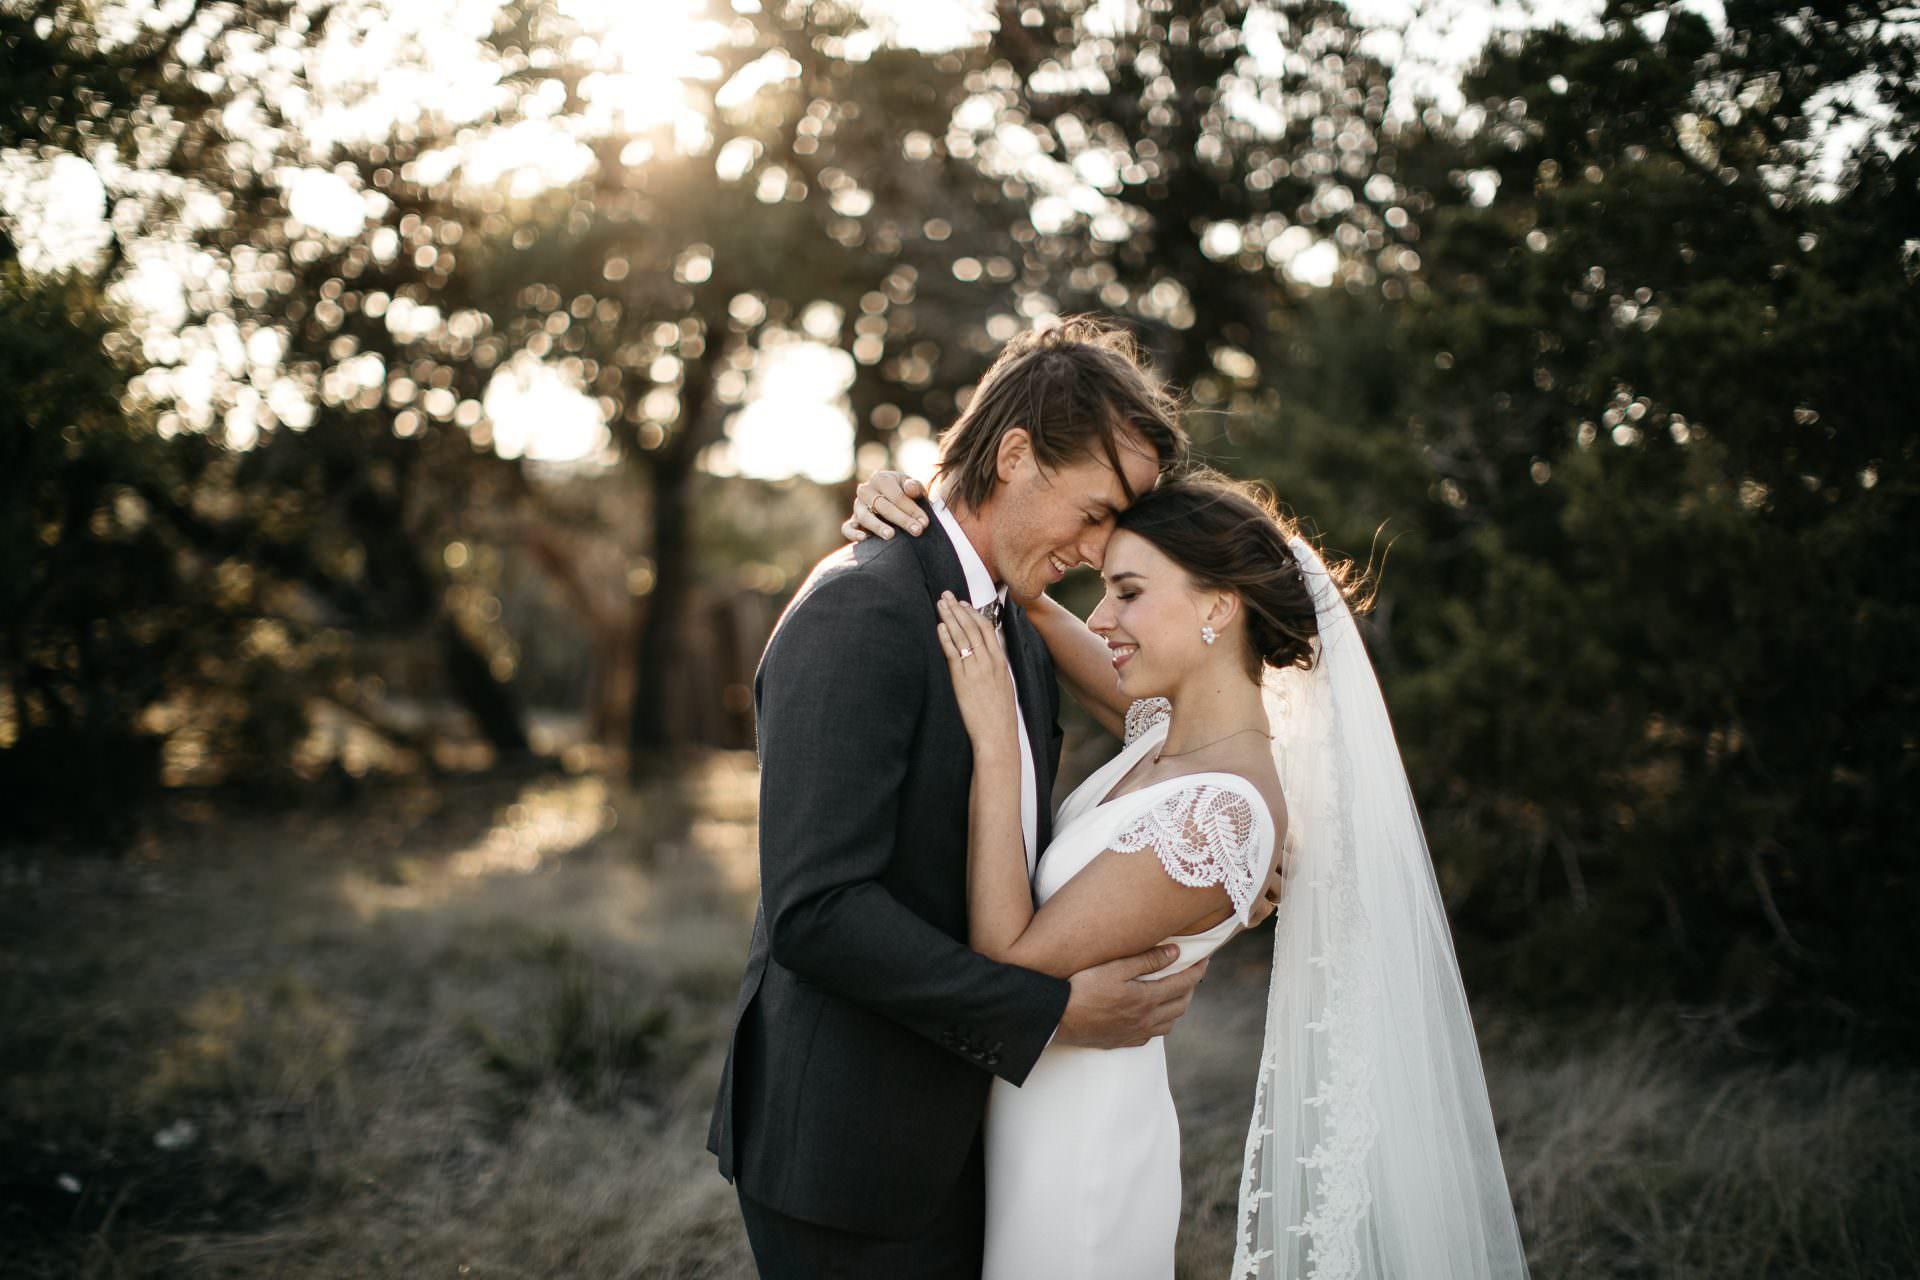 Kate & Luke's Wedding . Hunt, Texas